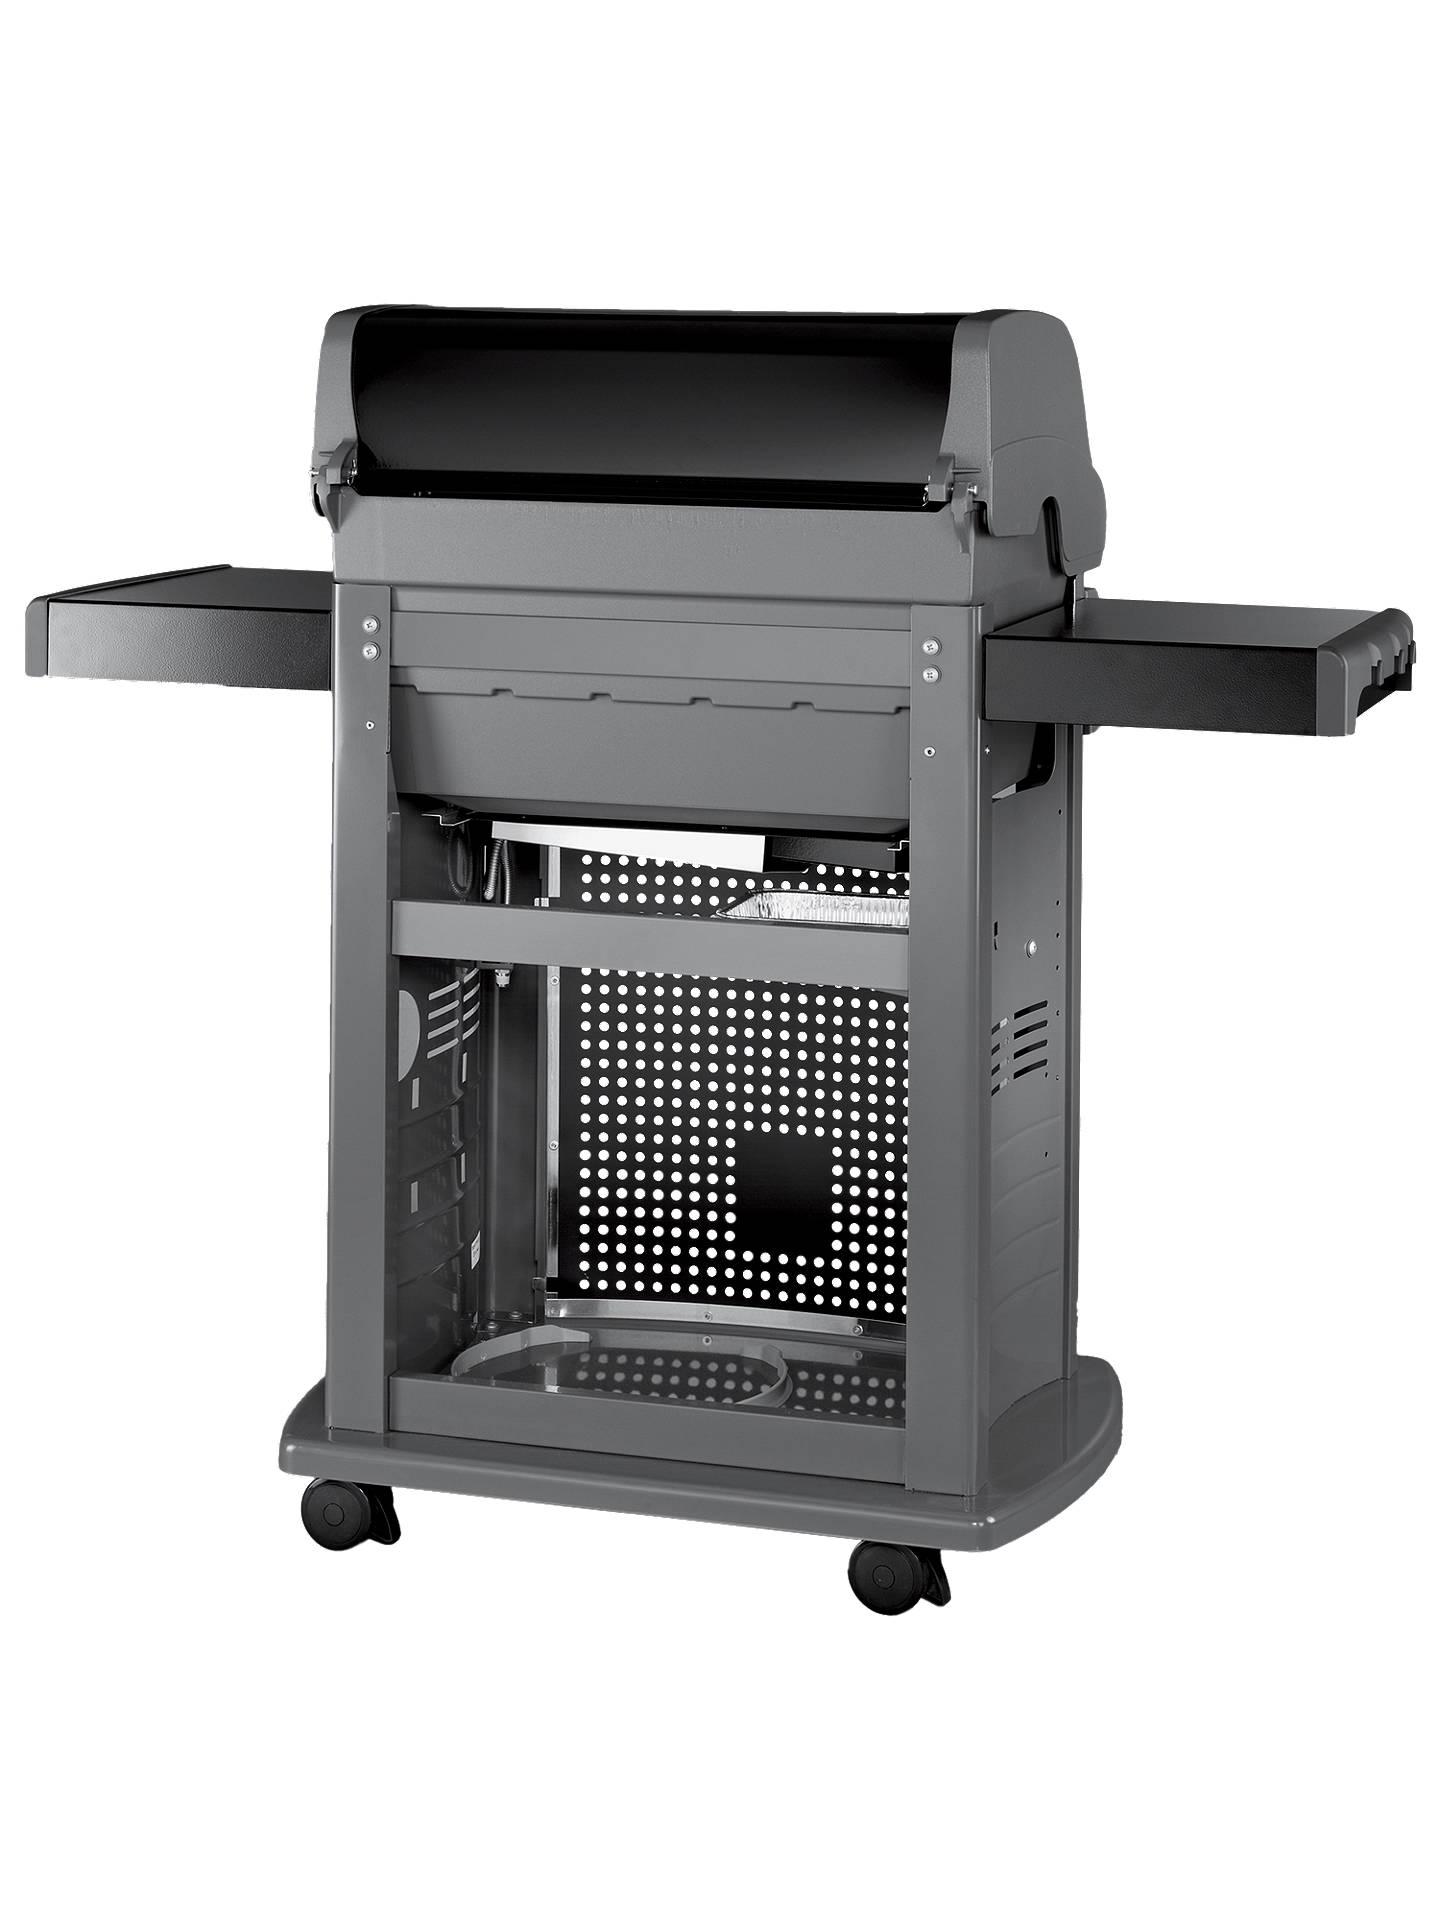 weber spirit classic e-310 3-burner gas bbq